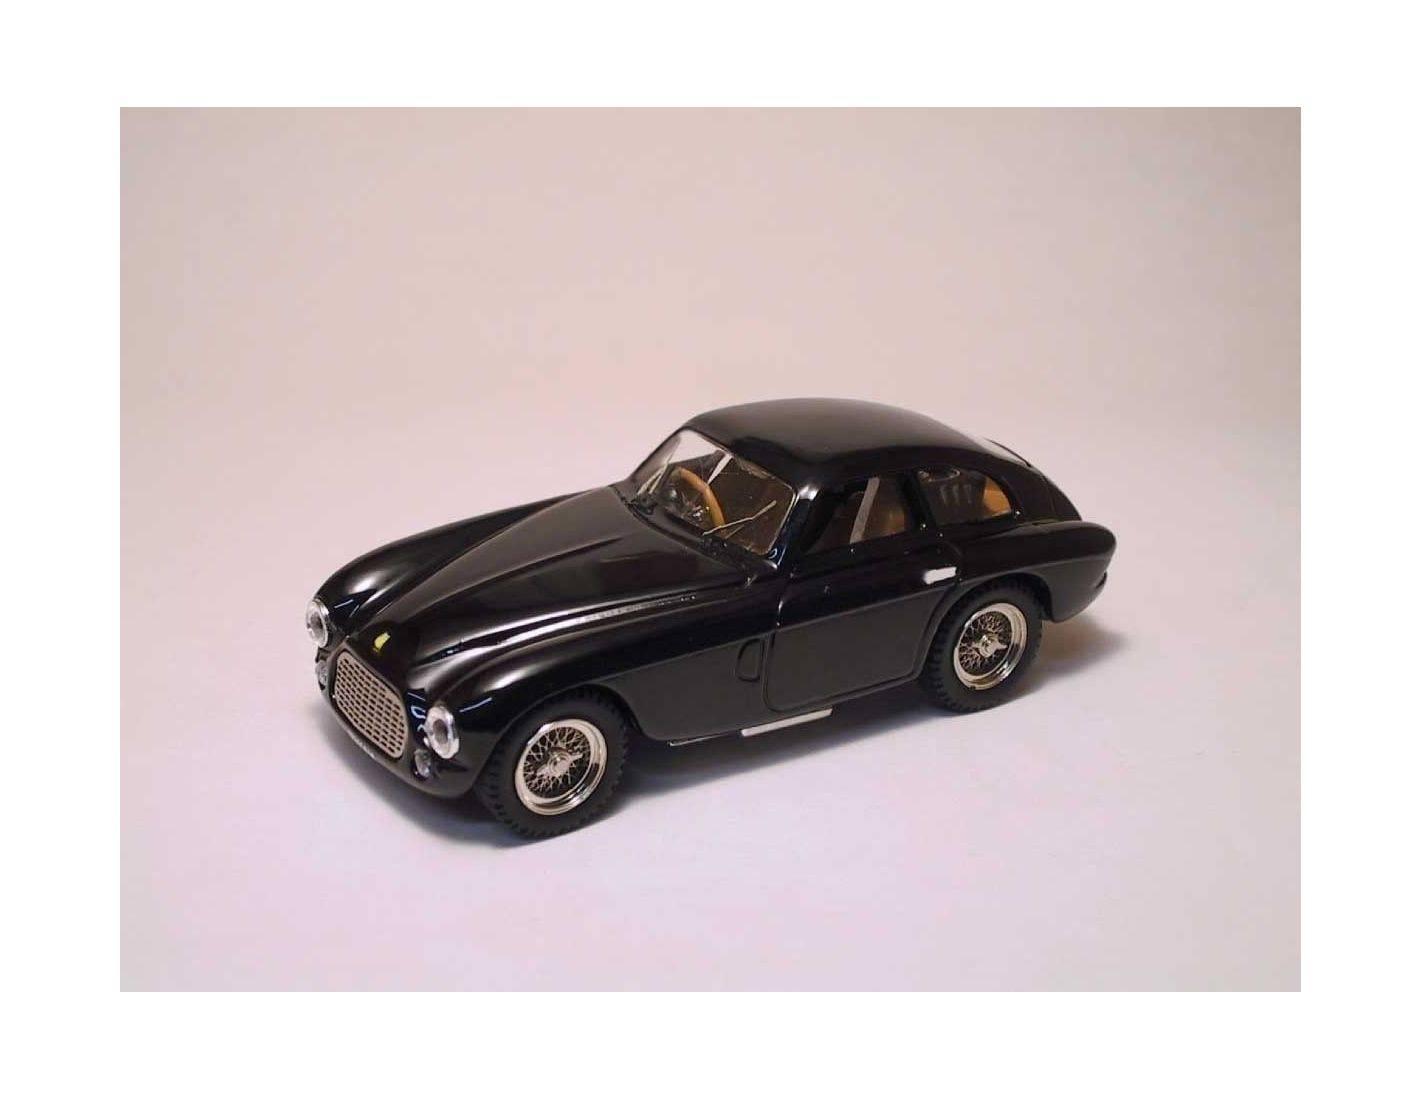 Art Model AM0003 FERRARI 166 MM COUPE' 1950 BLACK 1:43 Modellino